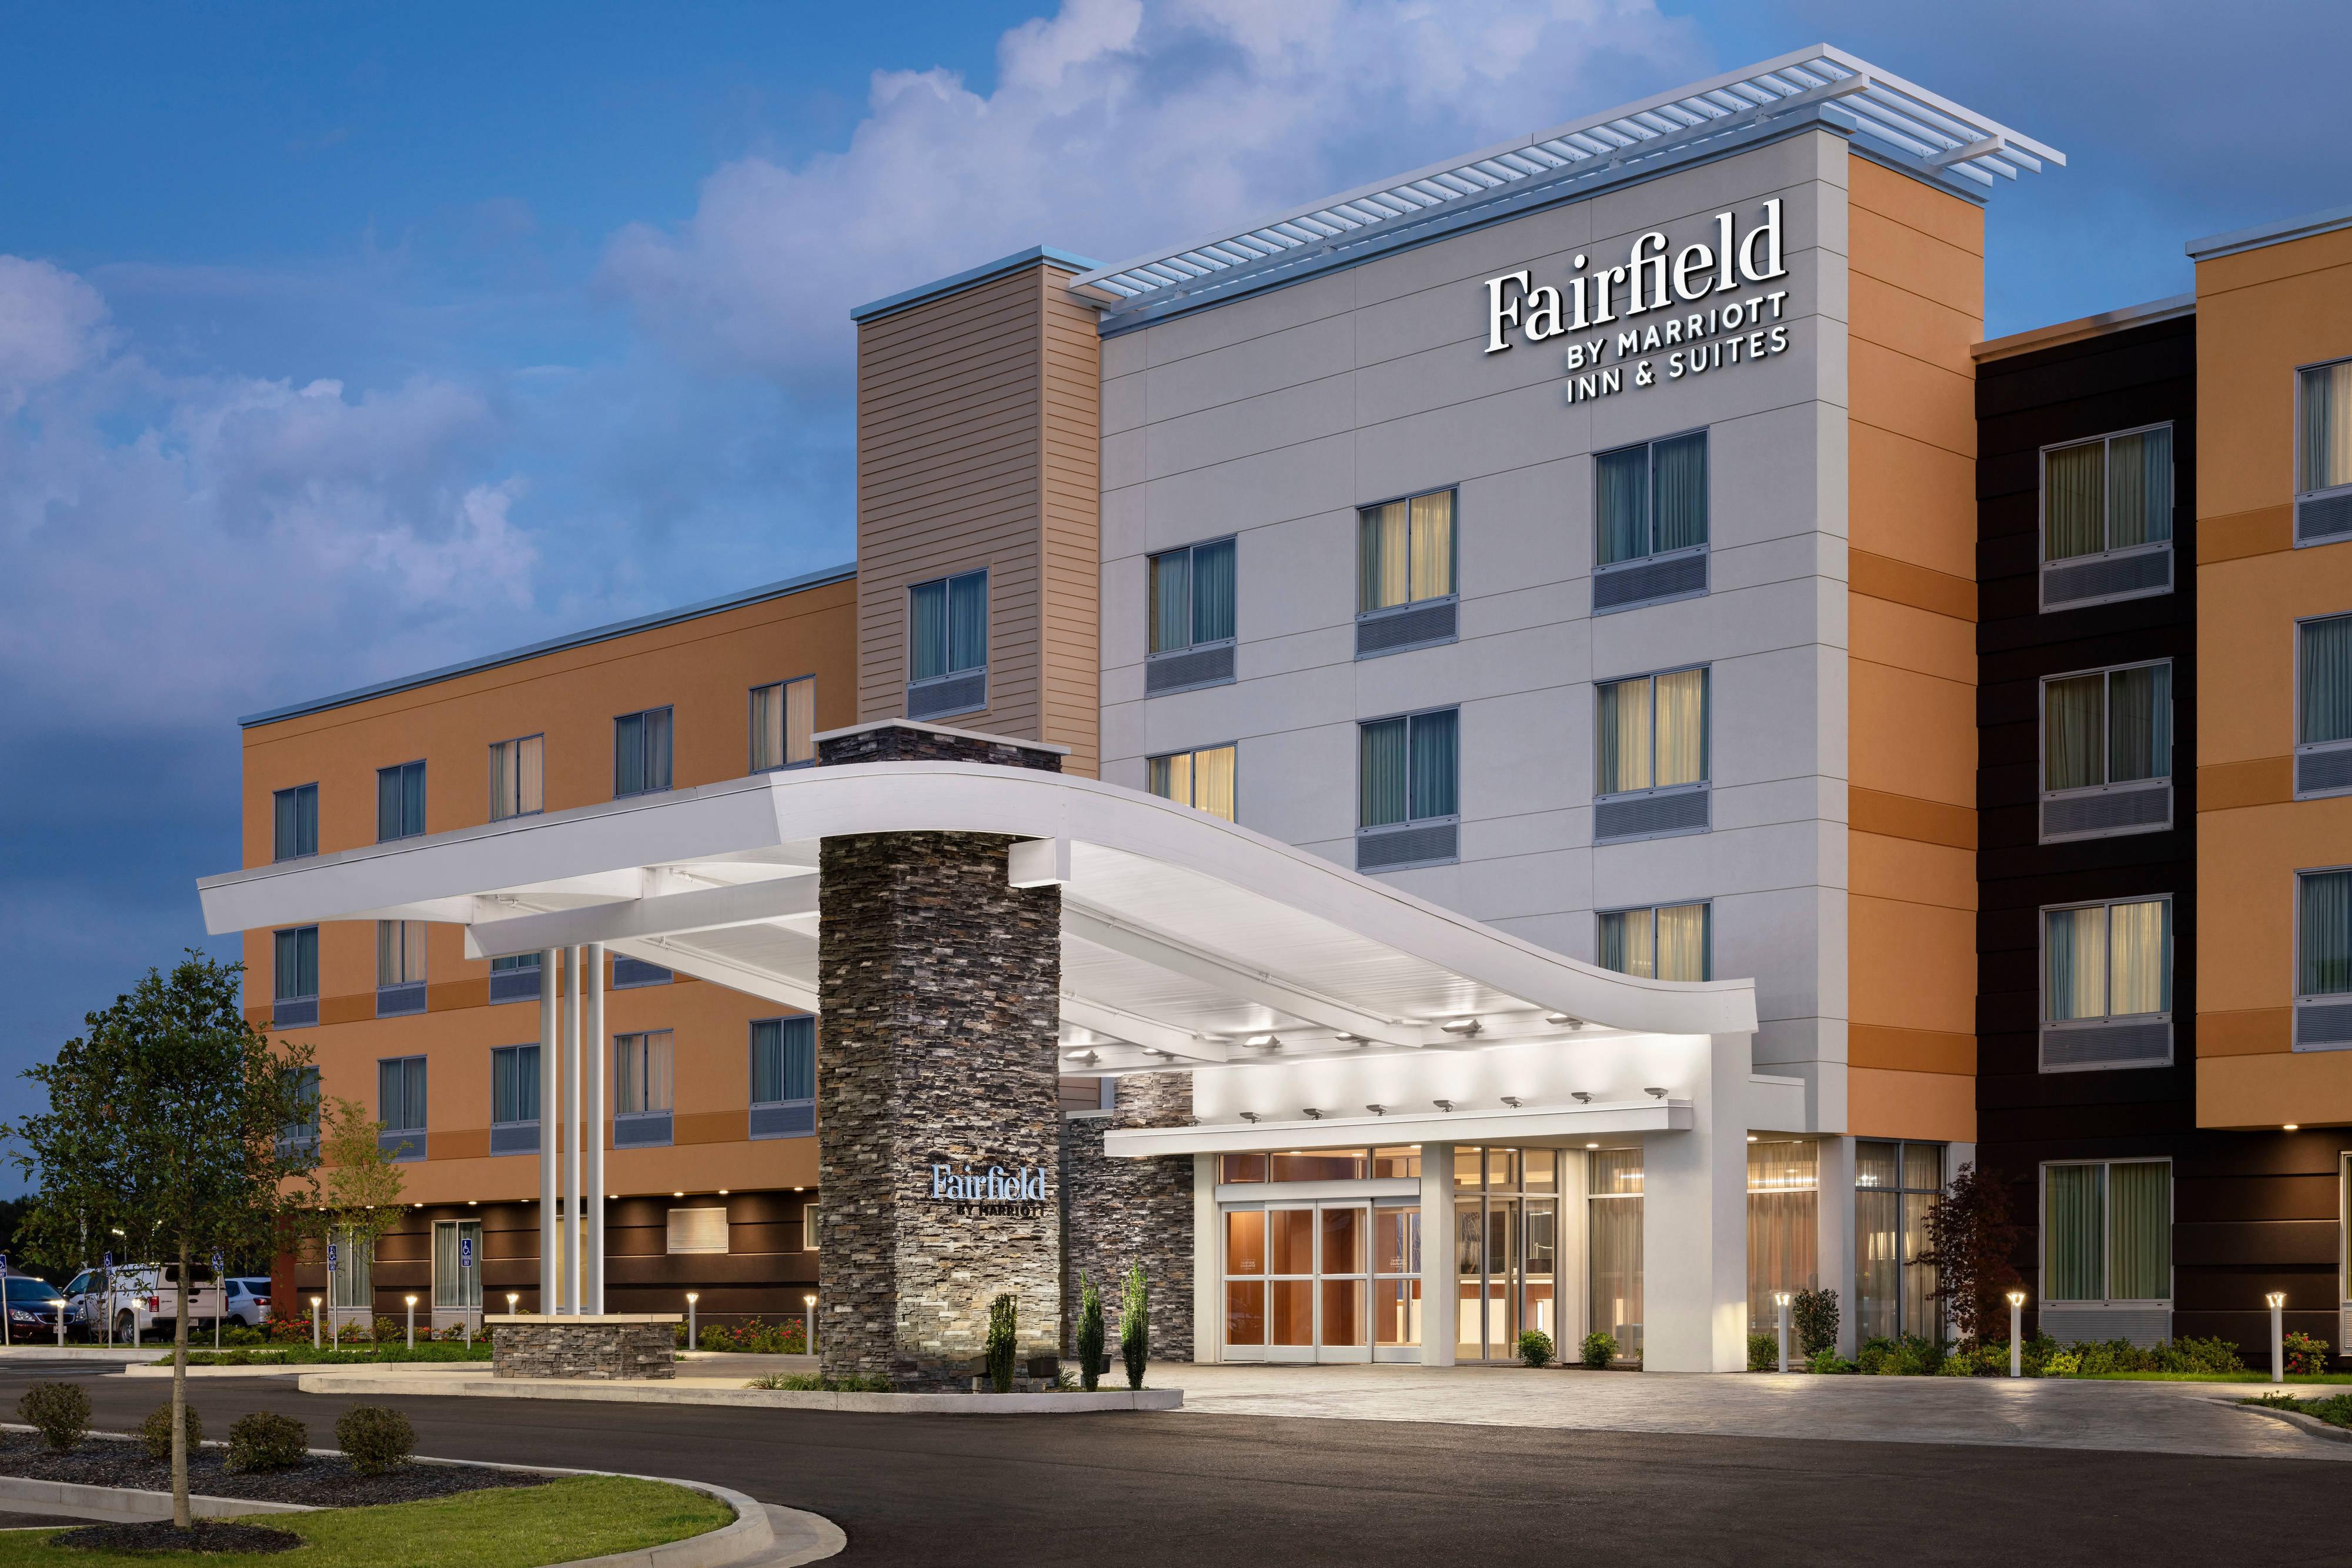 Fairfield Inn & Suites Selinsgrove